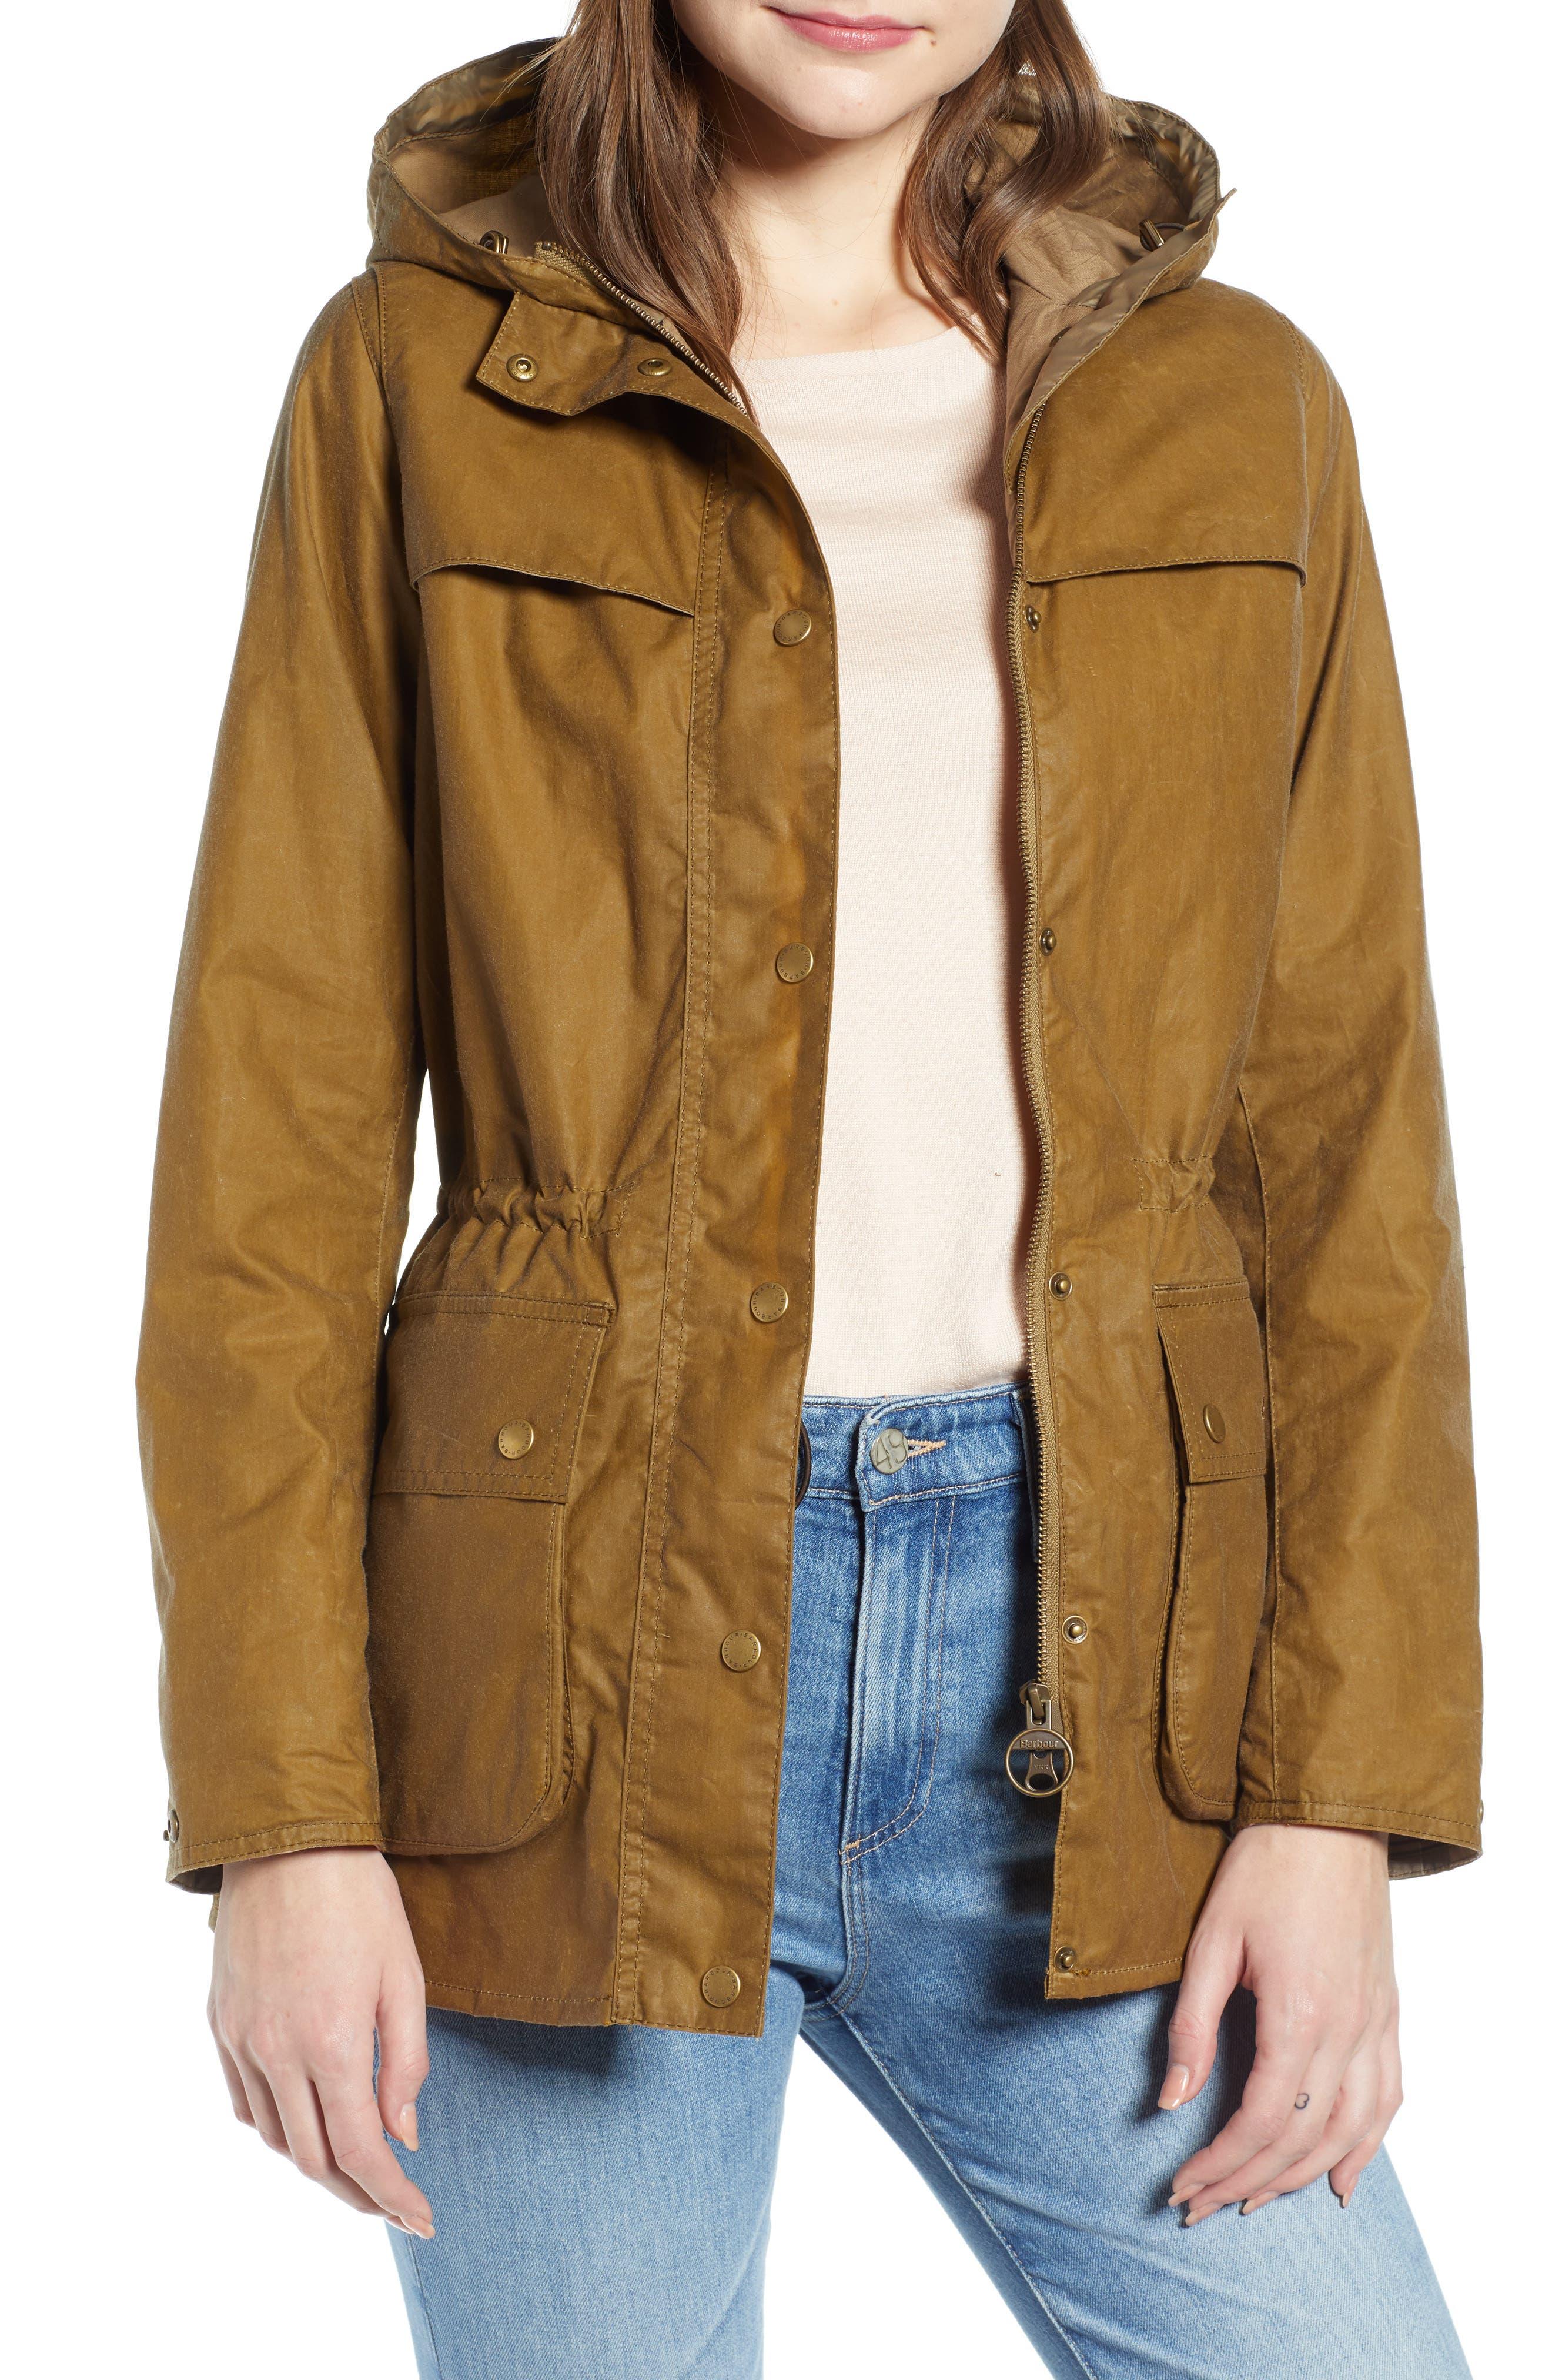 Barbour Durham Lightweight Wax Cotton Jacket, US / 16 UK - Green